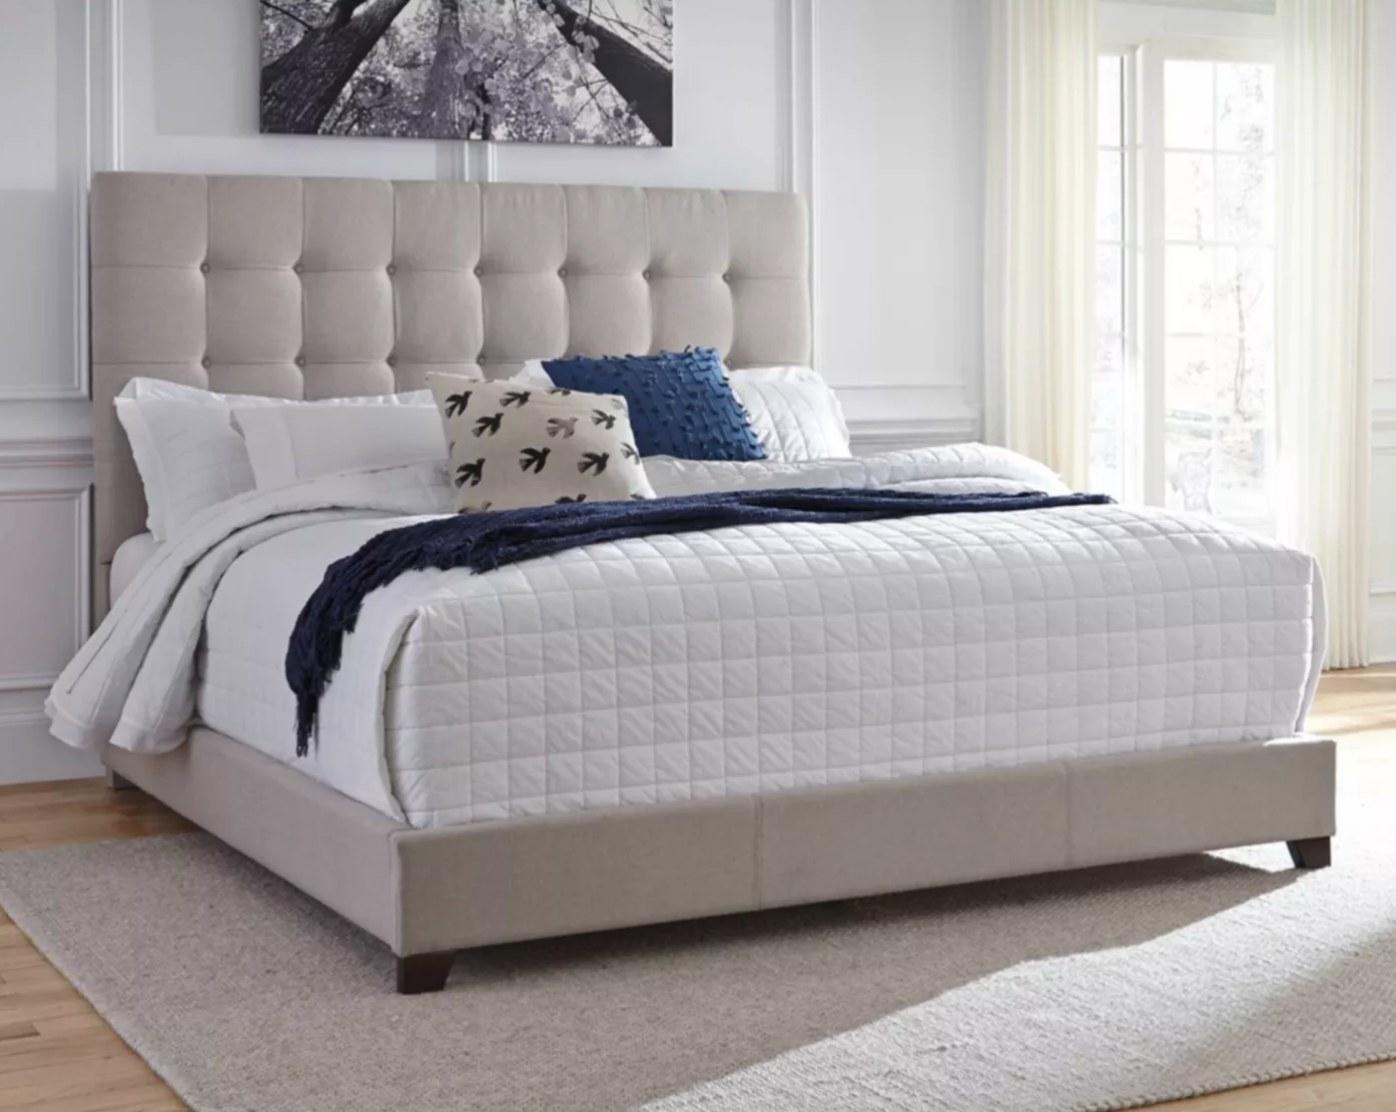 The upholstered bed frame in beige